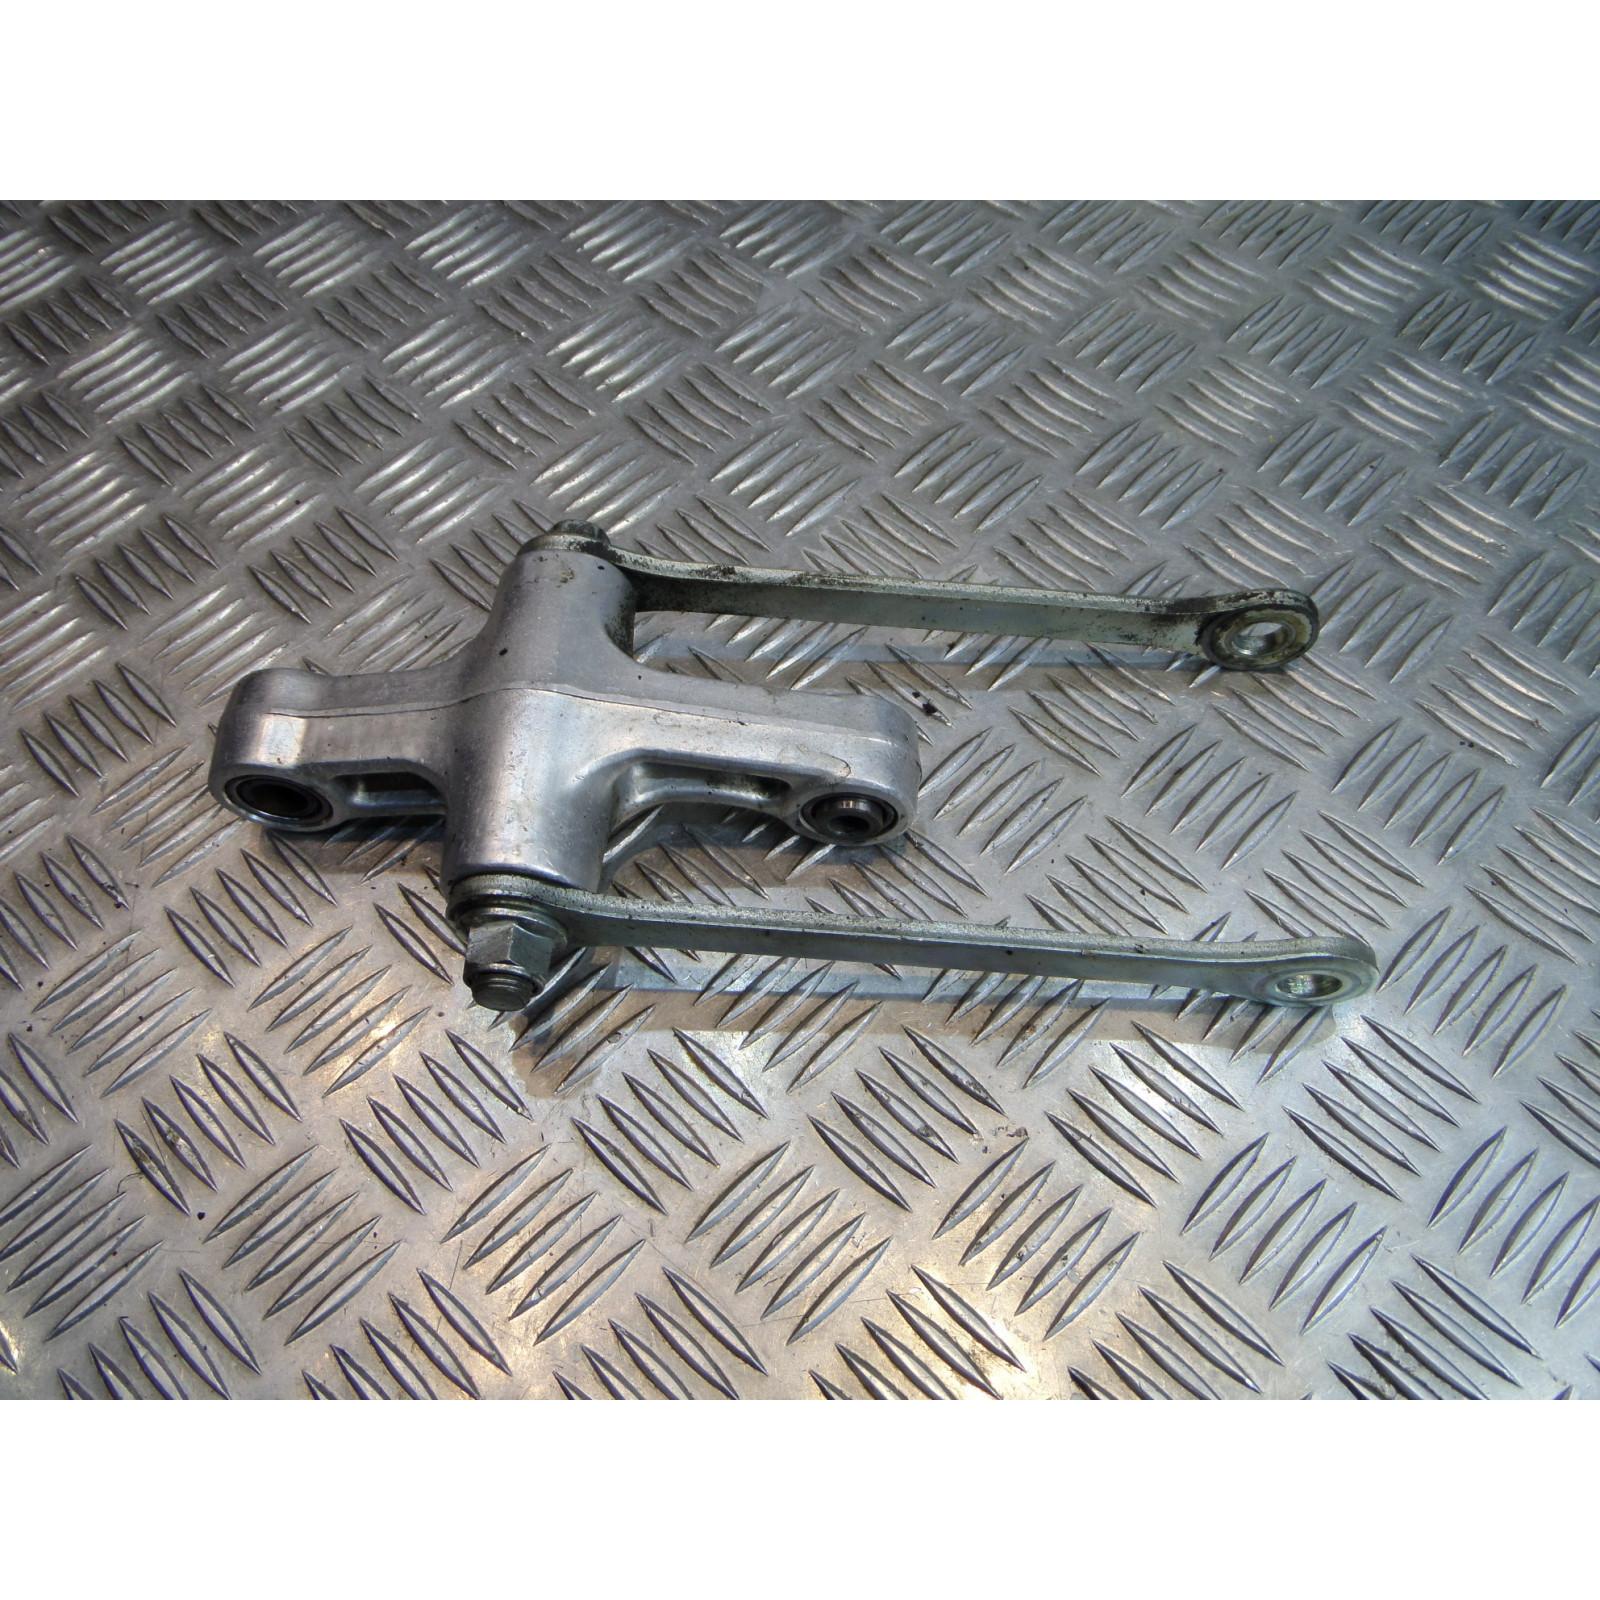 biellette amortisseur suspension moto suzuki gsx 600 f gsxf js1aj 1998 - 03